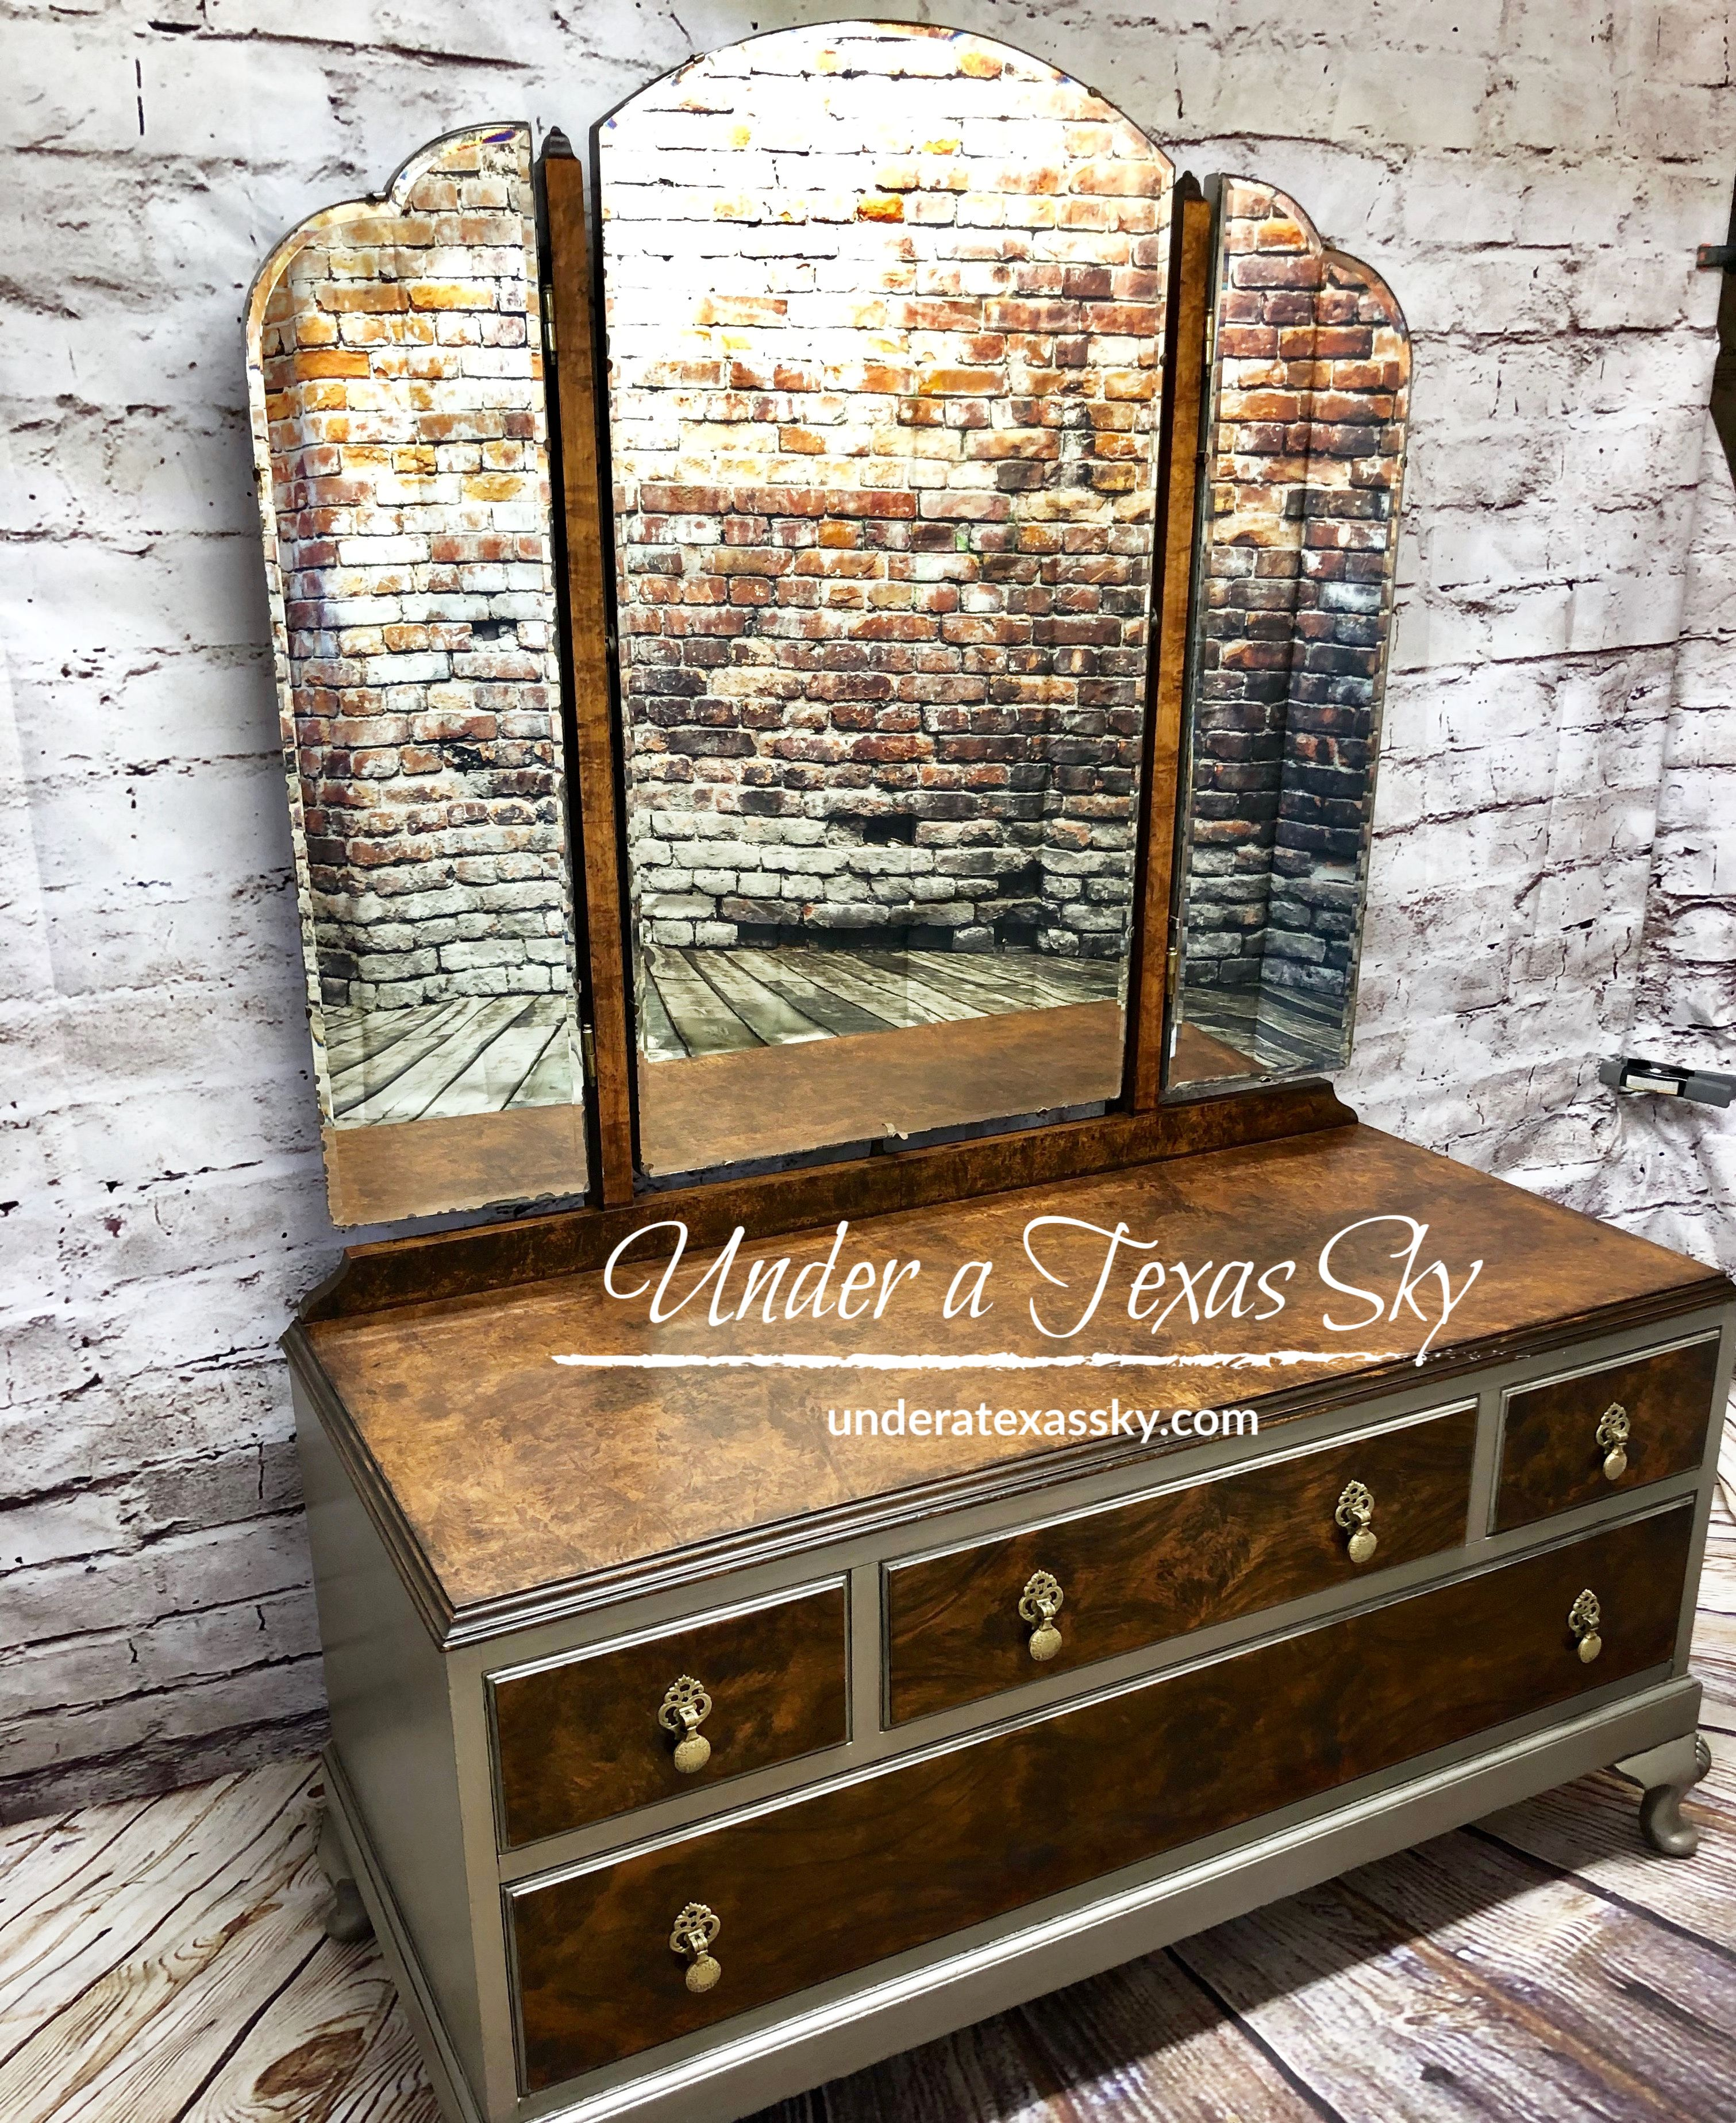 1920s Dressing Table Dixie Belle Moonshine Metallic Steel Magnolia Black Glaze Refinishing Furniture 1920s Dressing Table Dixie Belle Paint